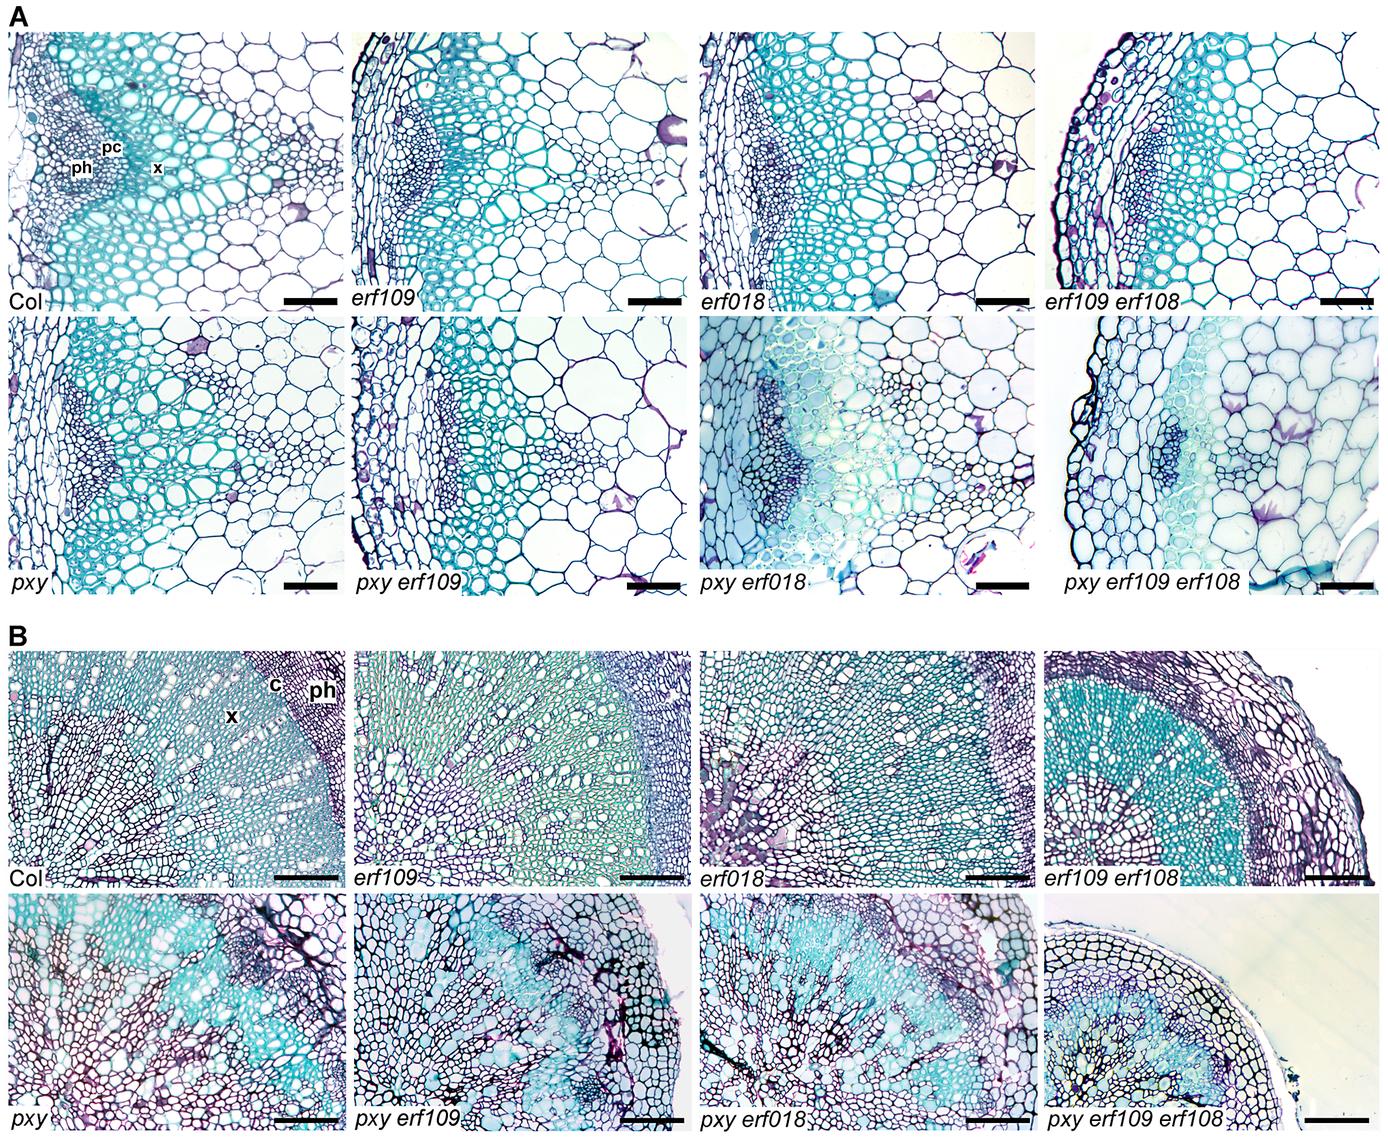 <i>pxy</i> interacts with <i>erf</i> transcription factors.